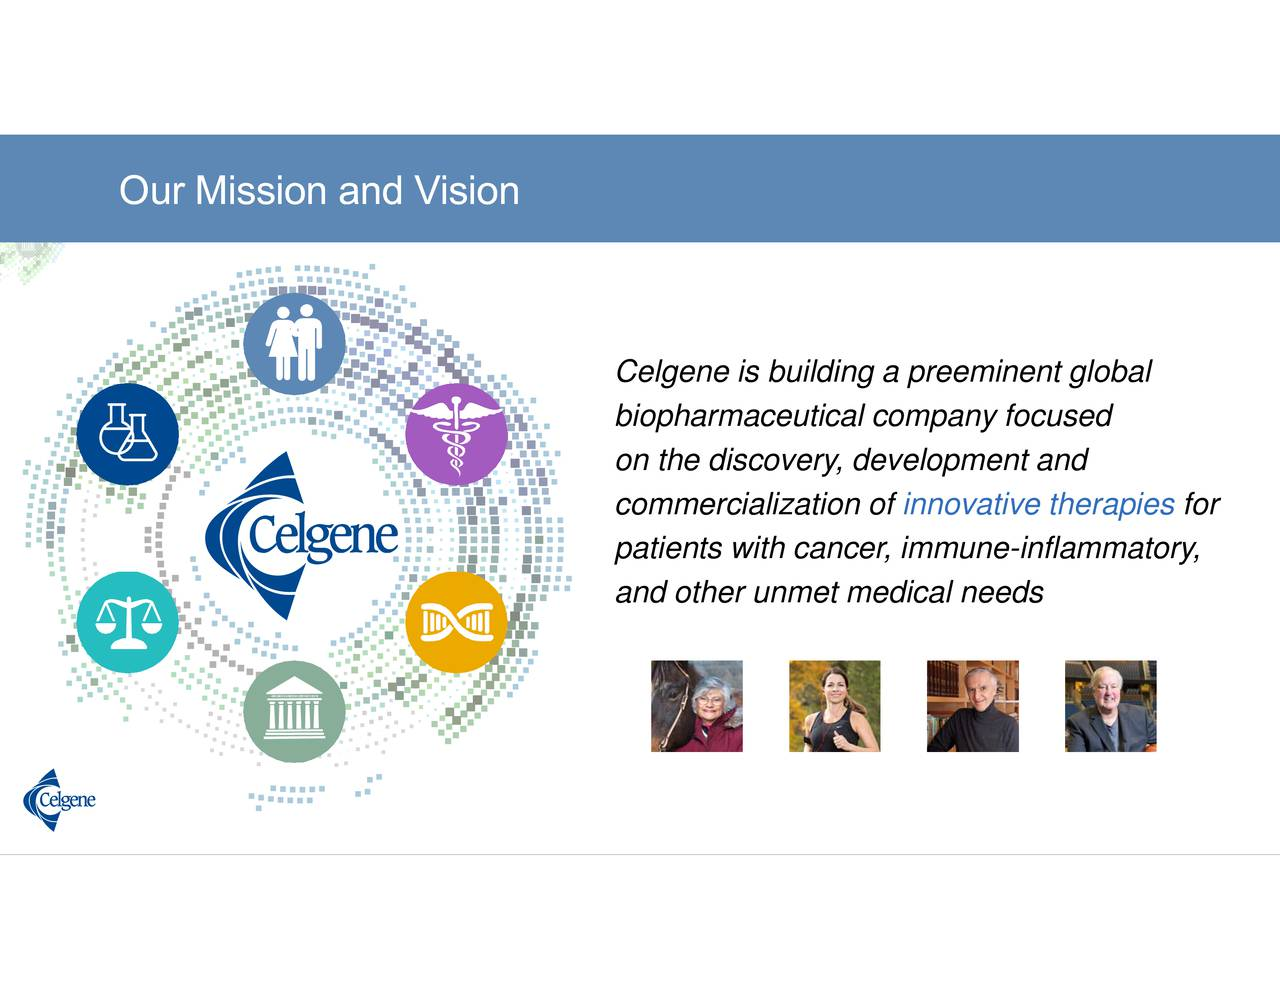 innovative therapies Celgoneniheaceiritap,eeonioyntelobcldl-nfammatory, OuurrMiissionn andd Visionn